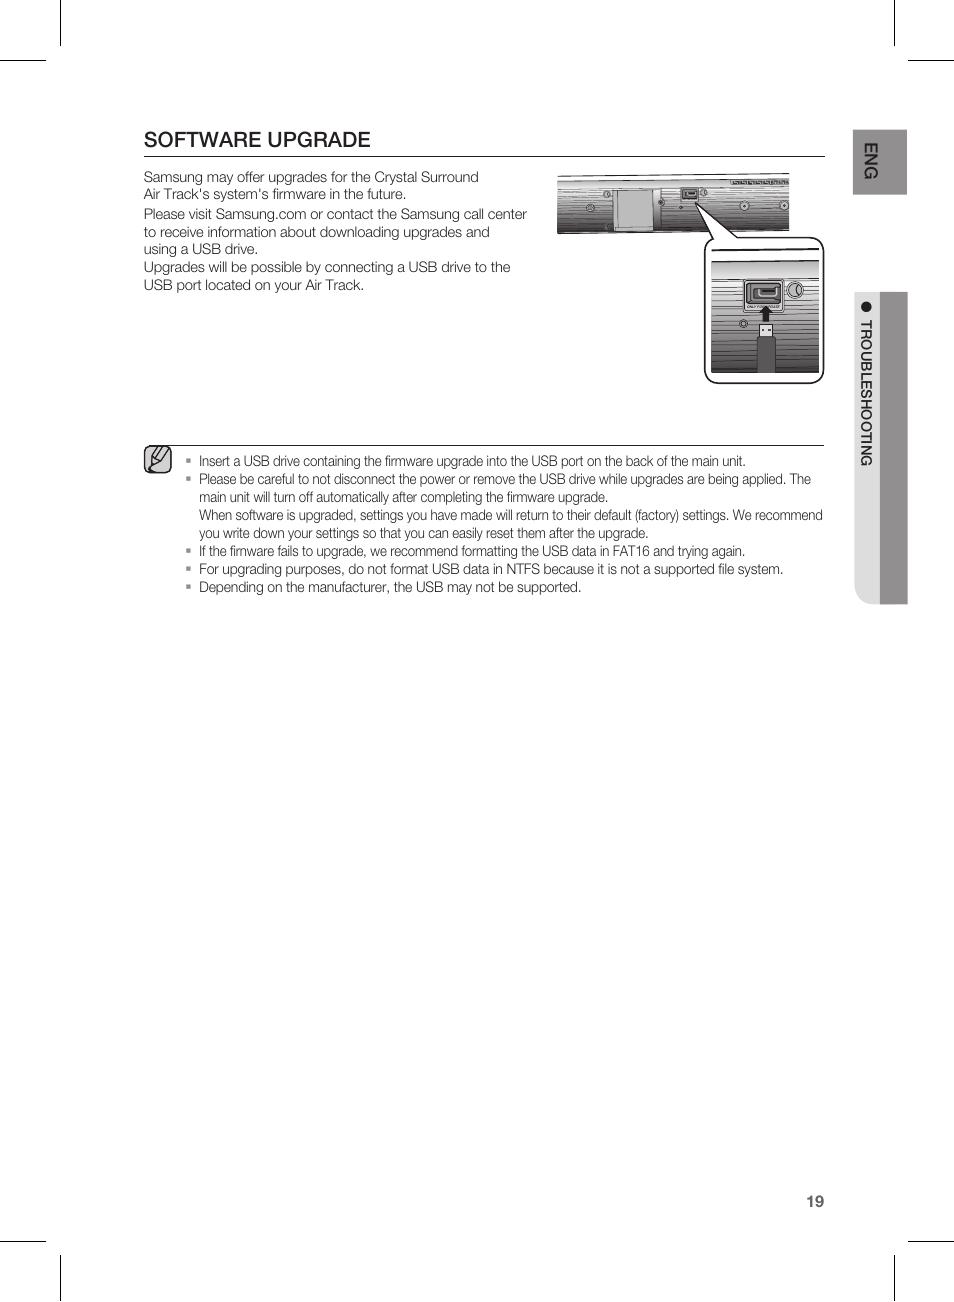 software upgrade samsung hw d450 za user manual page 19 24 rh manualsdir com samsung soundbar hw d450 user manual Samsung HW-D450 Audio